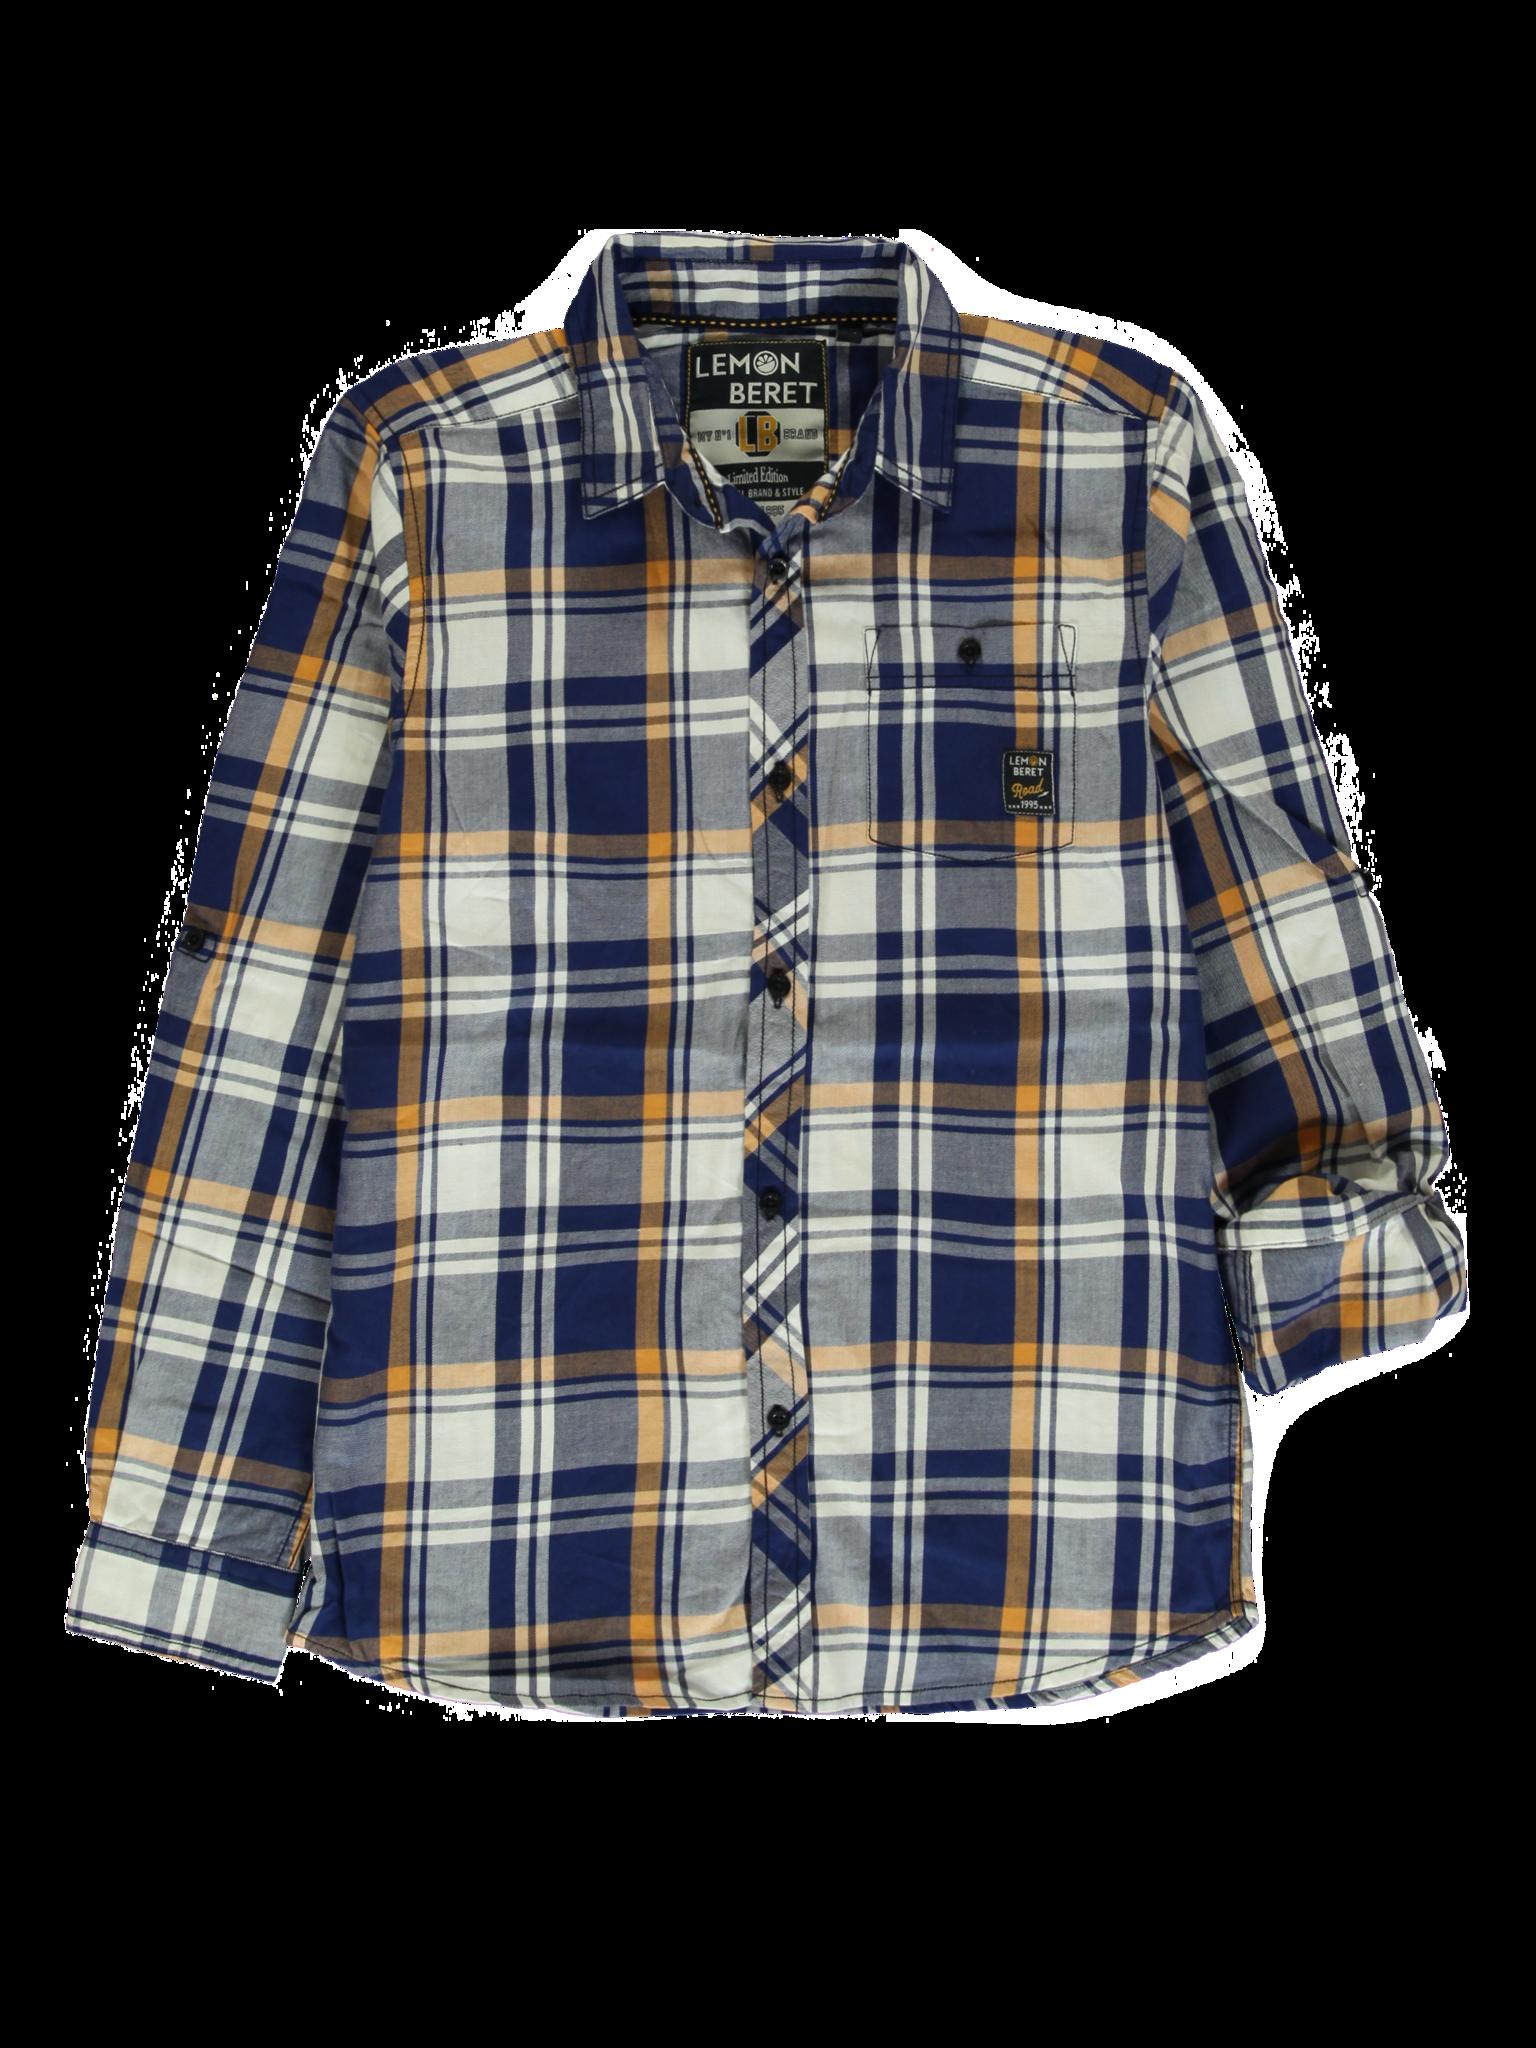 All Brands | Winterproducts Teen Boys | Shirt | 10 pcs/box